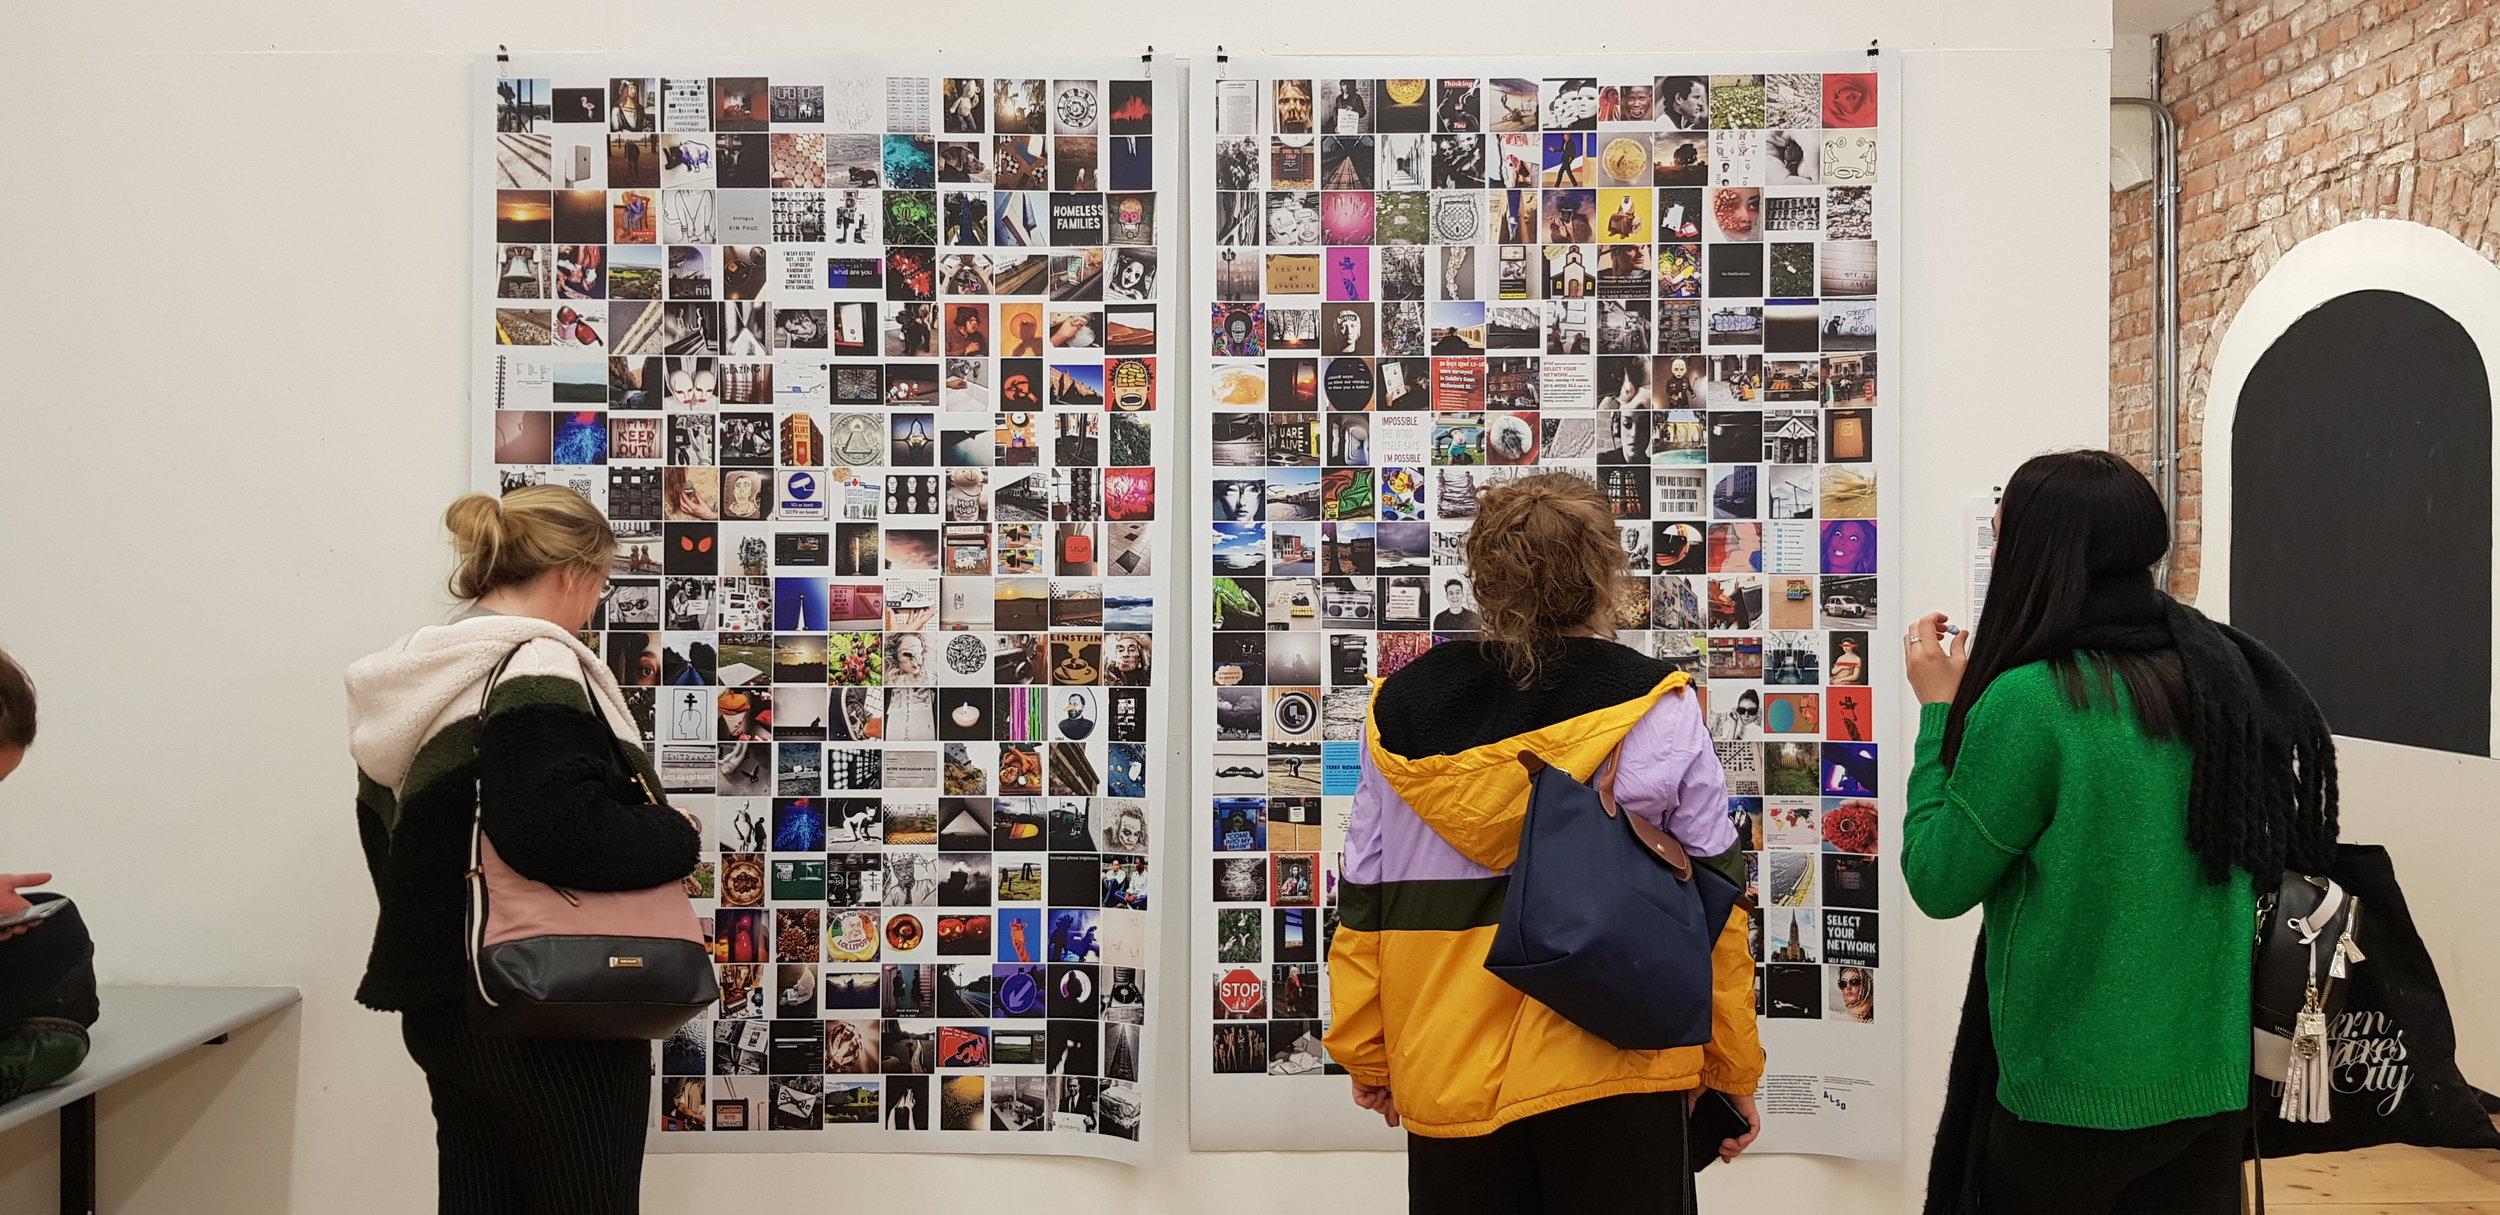 Students visit SELECT YOUR NETWORK (2) exhibition, Grangegorman campus, December 2018